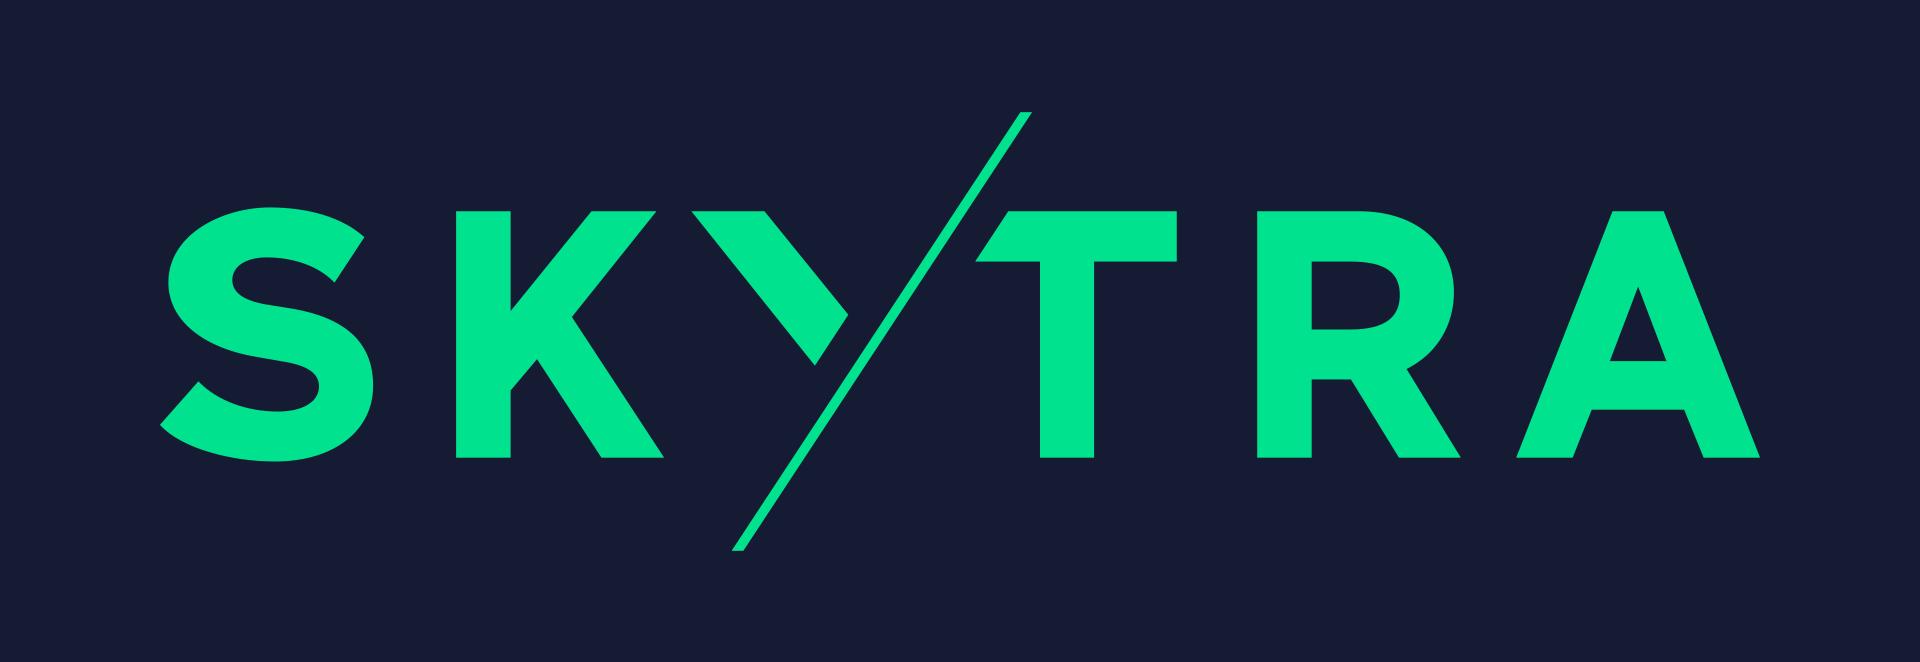 Skytra Wordmark